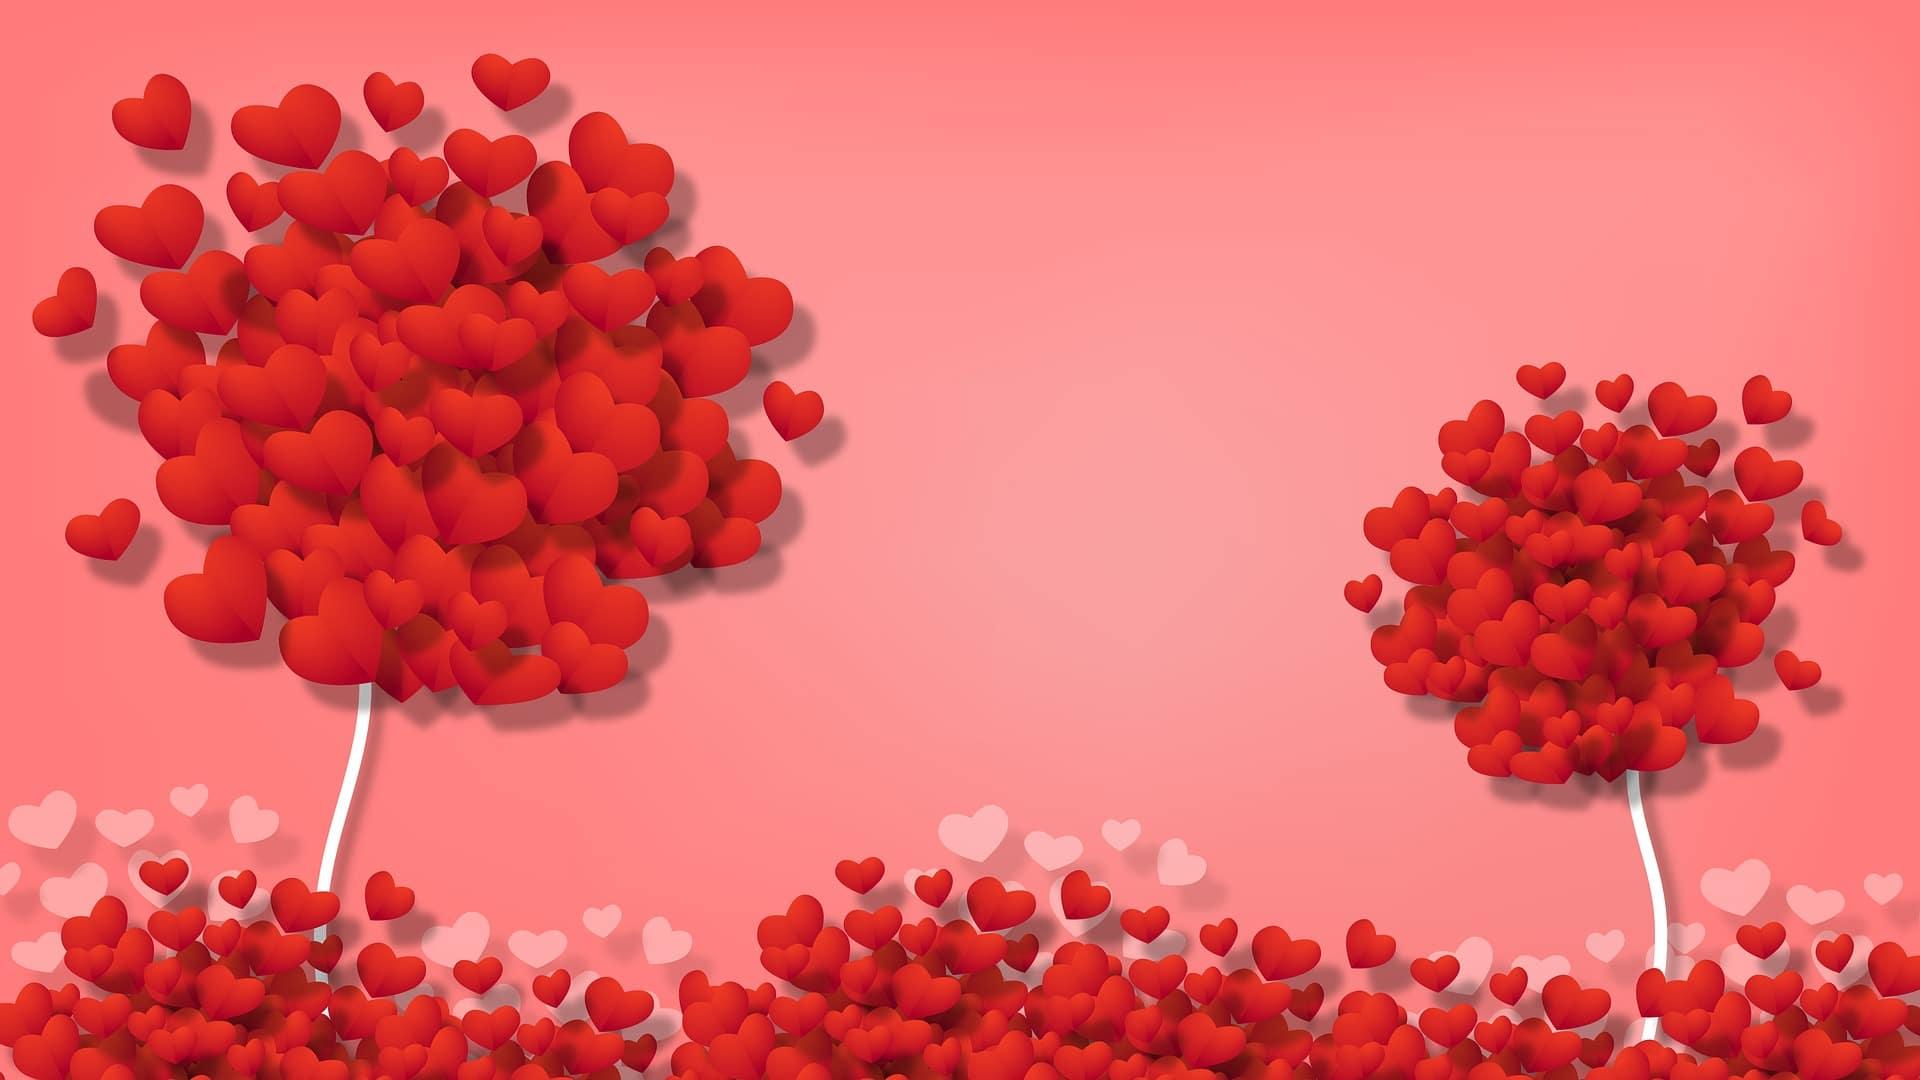 El amor mejora tu salud bucodental